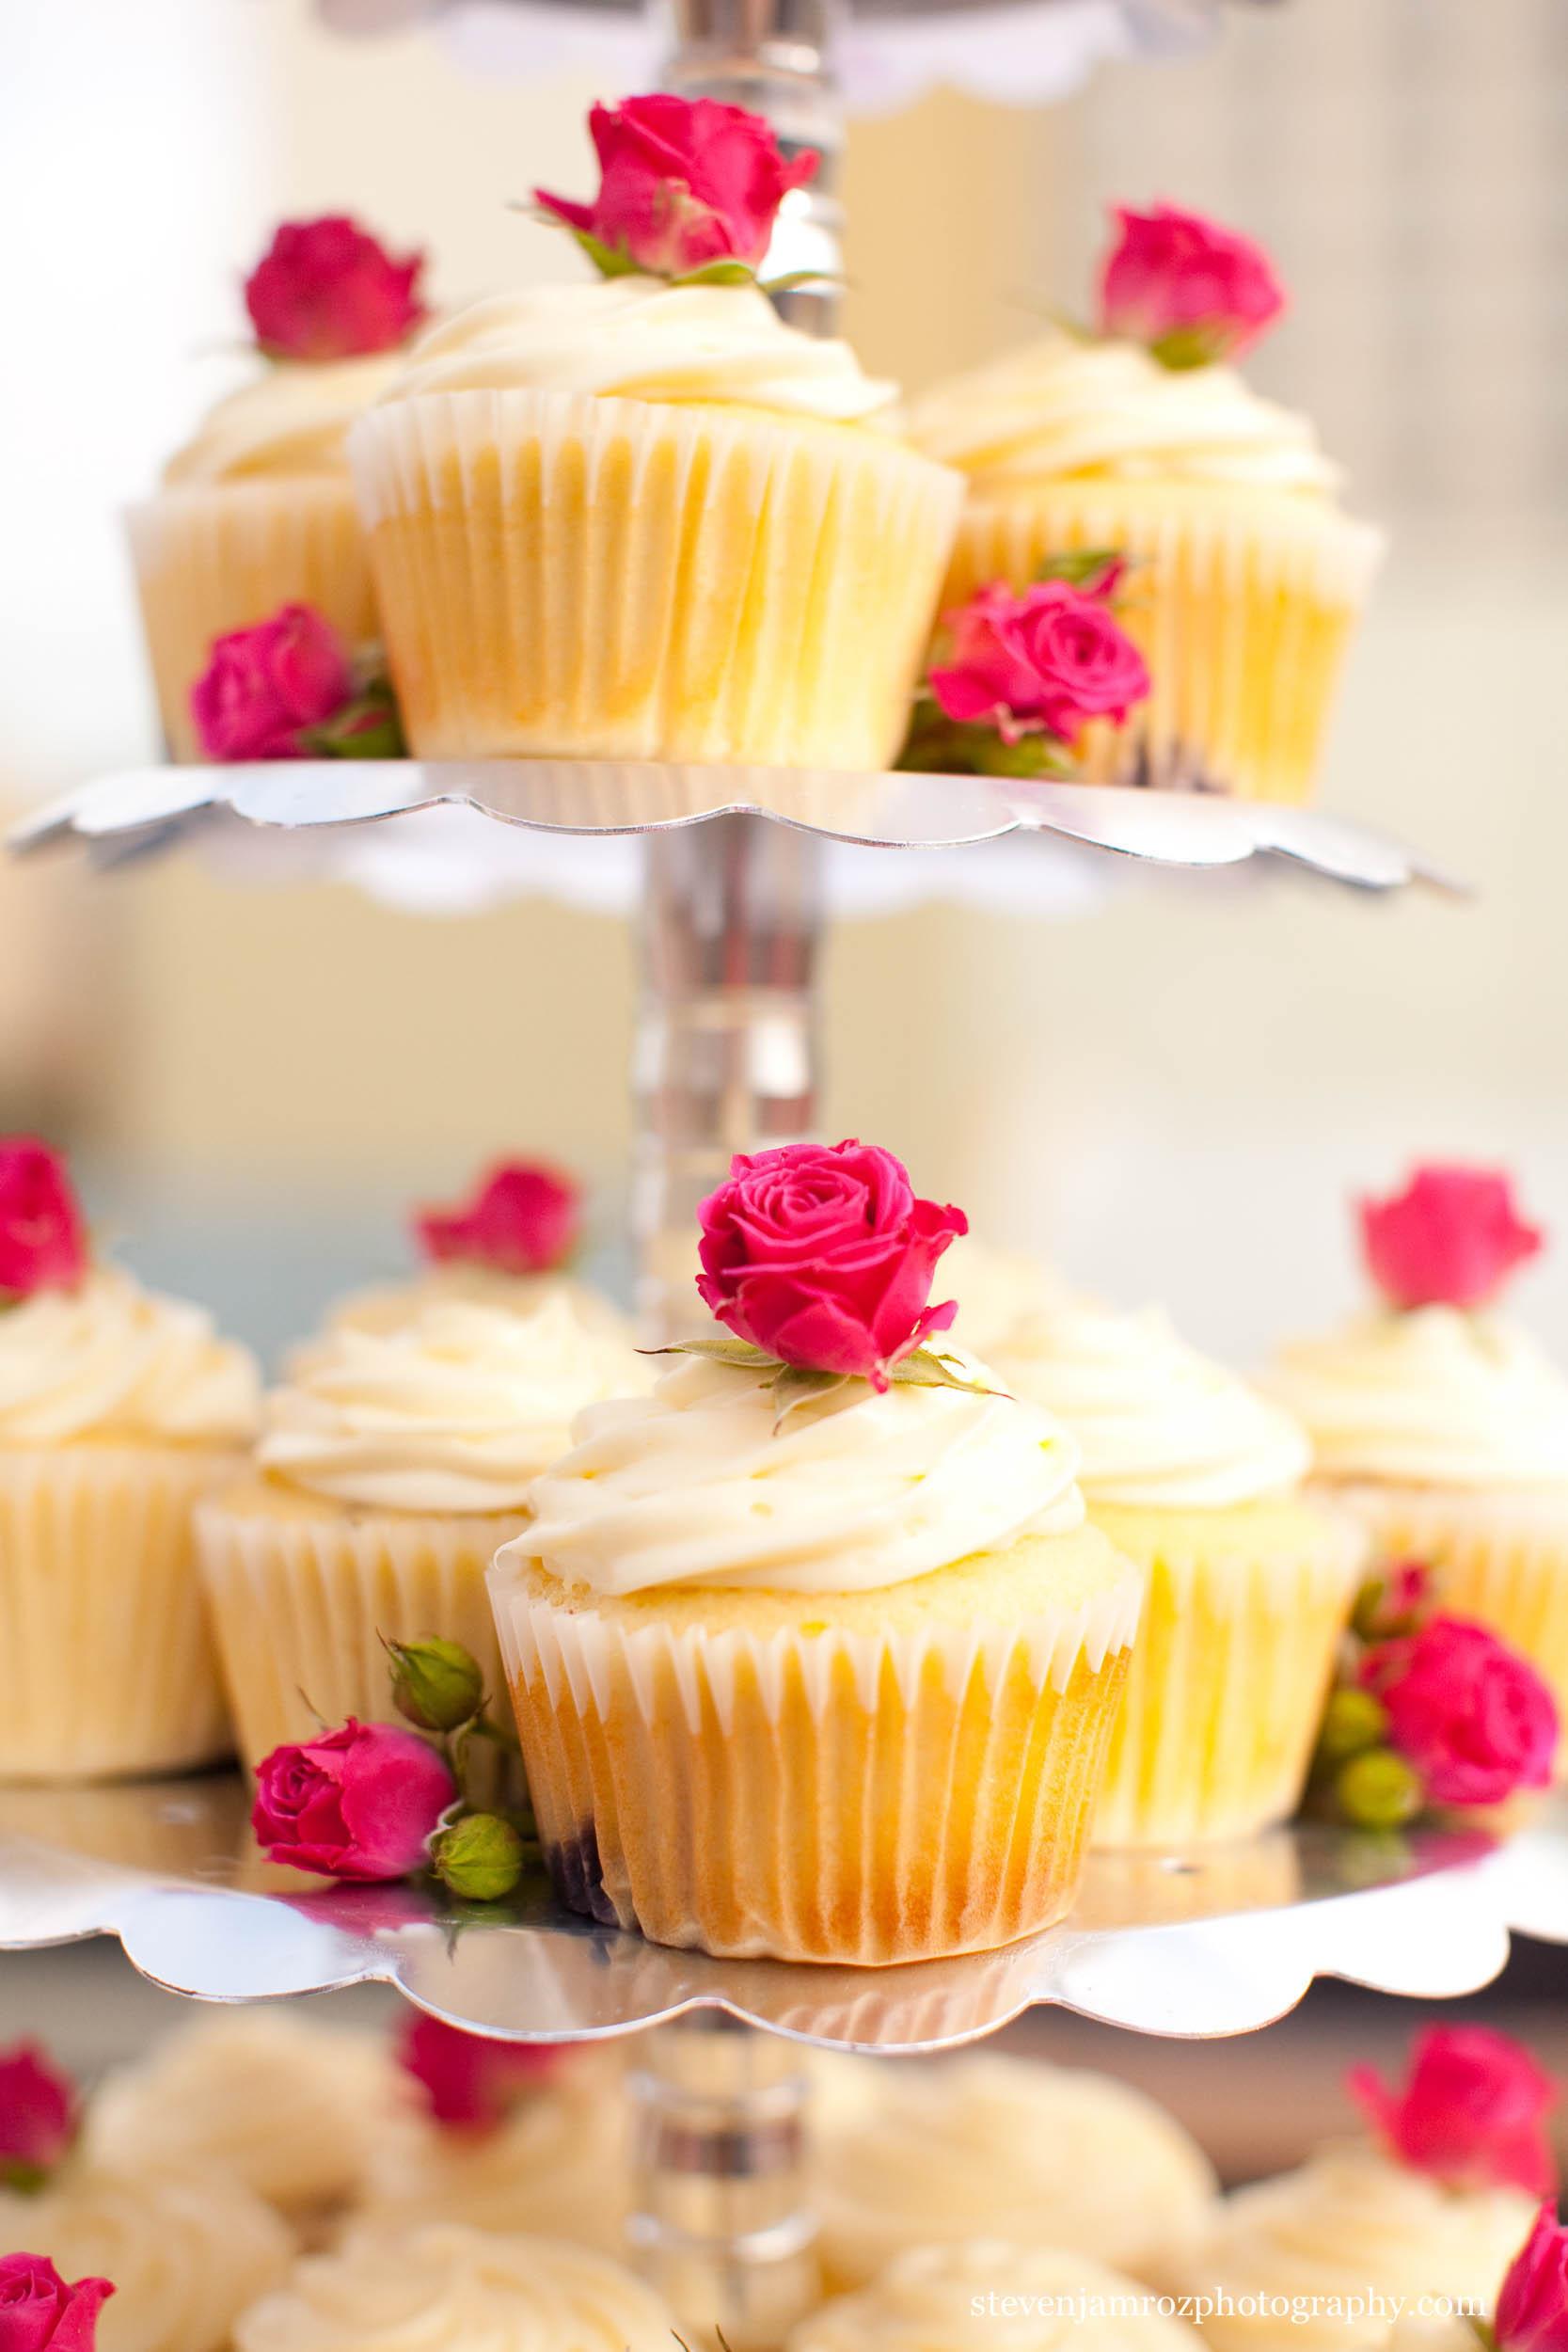 cupcakes-and-cake-wedding-raleigh-photography-0926.jpg